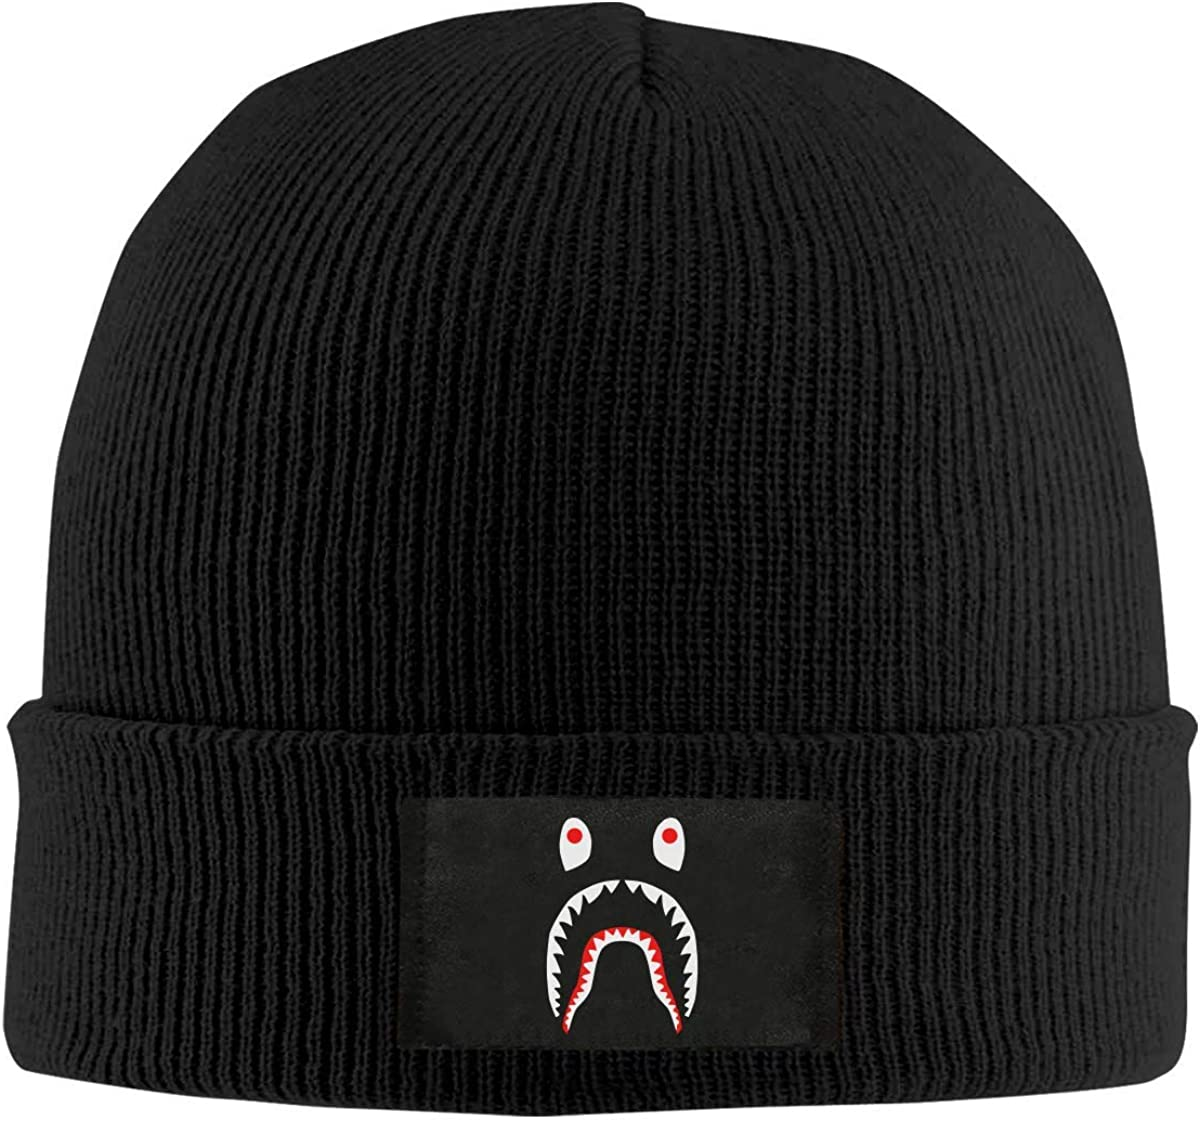 PatriciaANewbury BAPE Winter Warm Men Women Knitted Hat Stretch Slouchy Skull Cap